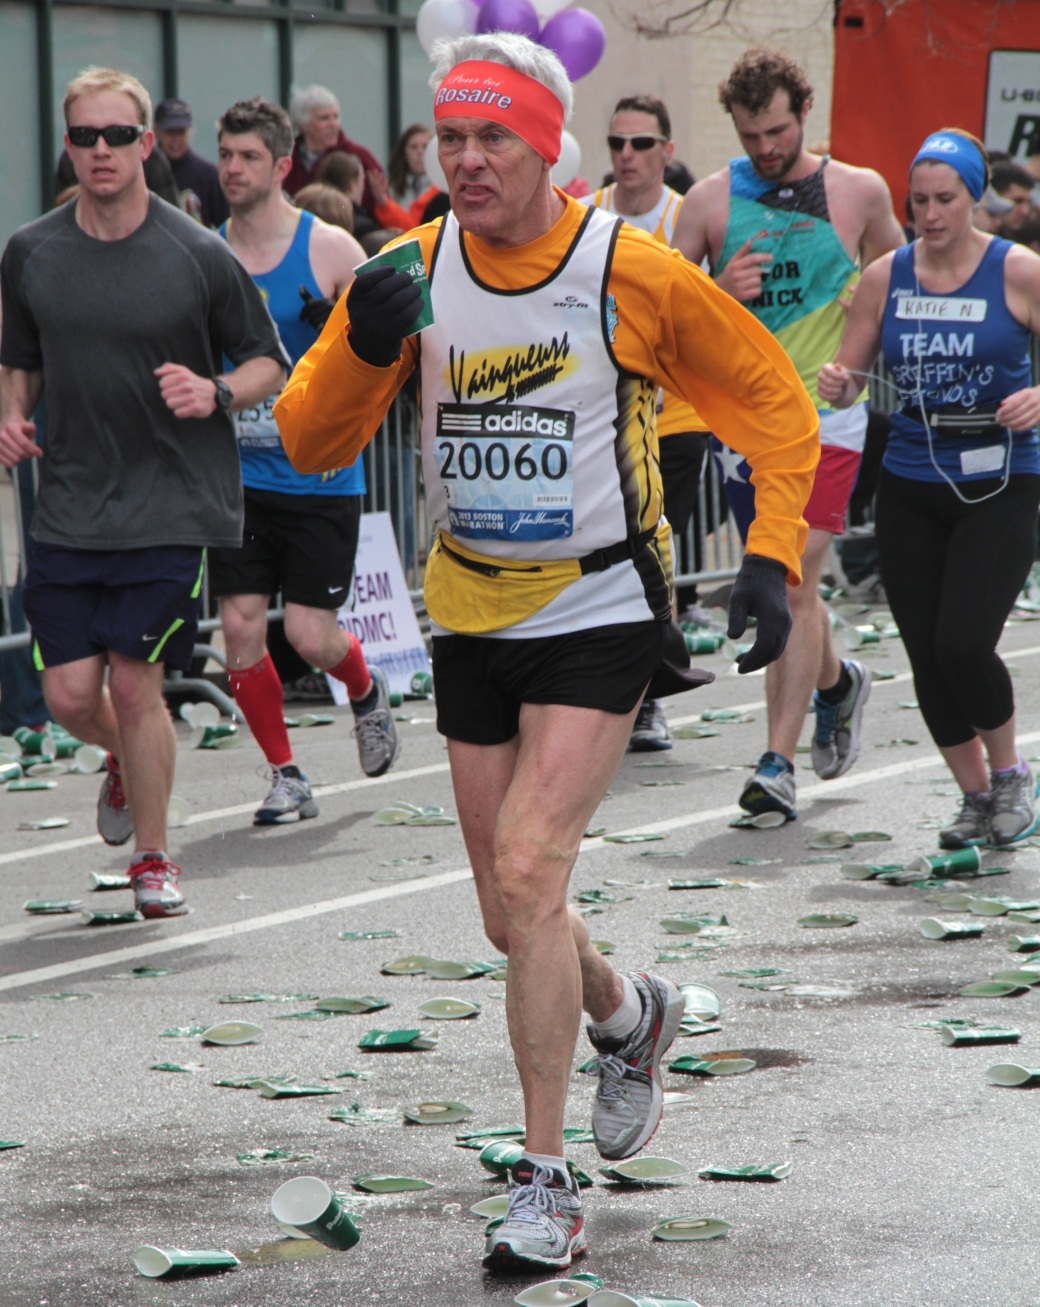 boston marathon 2013 number 20060